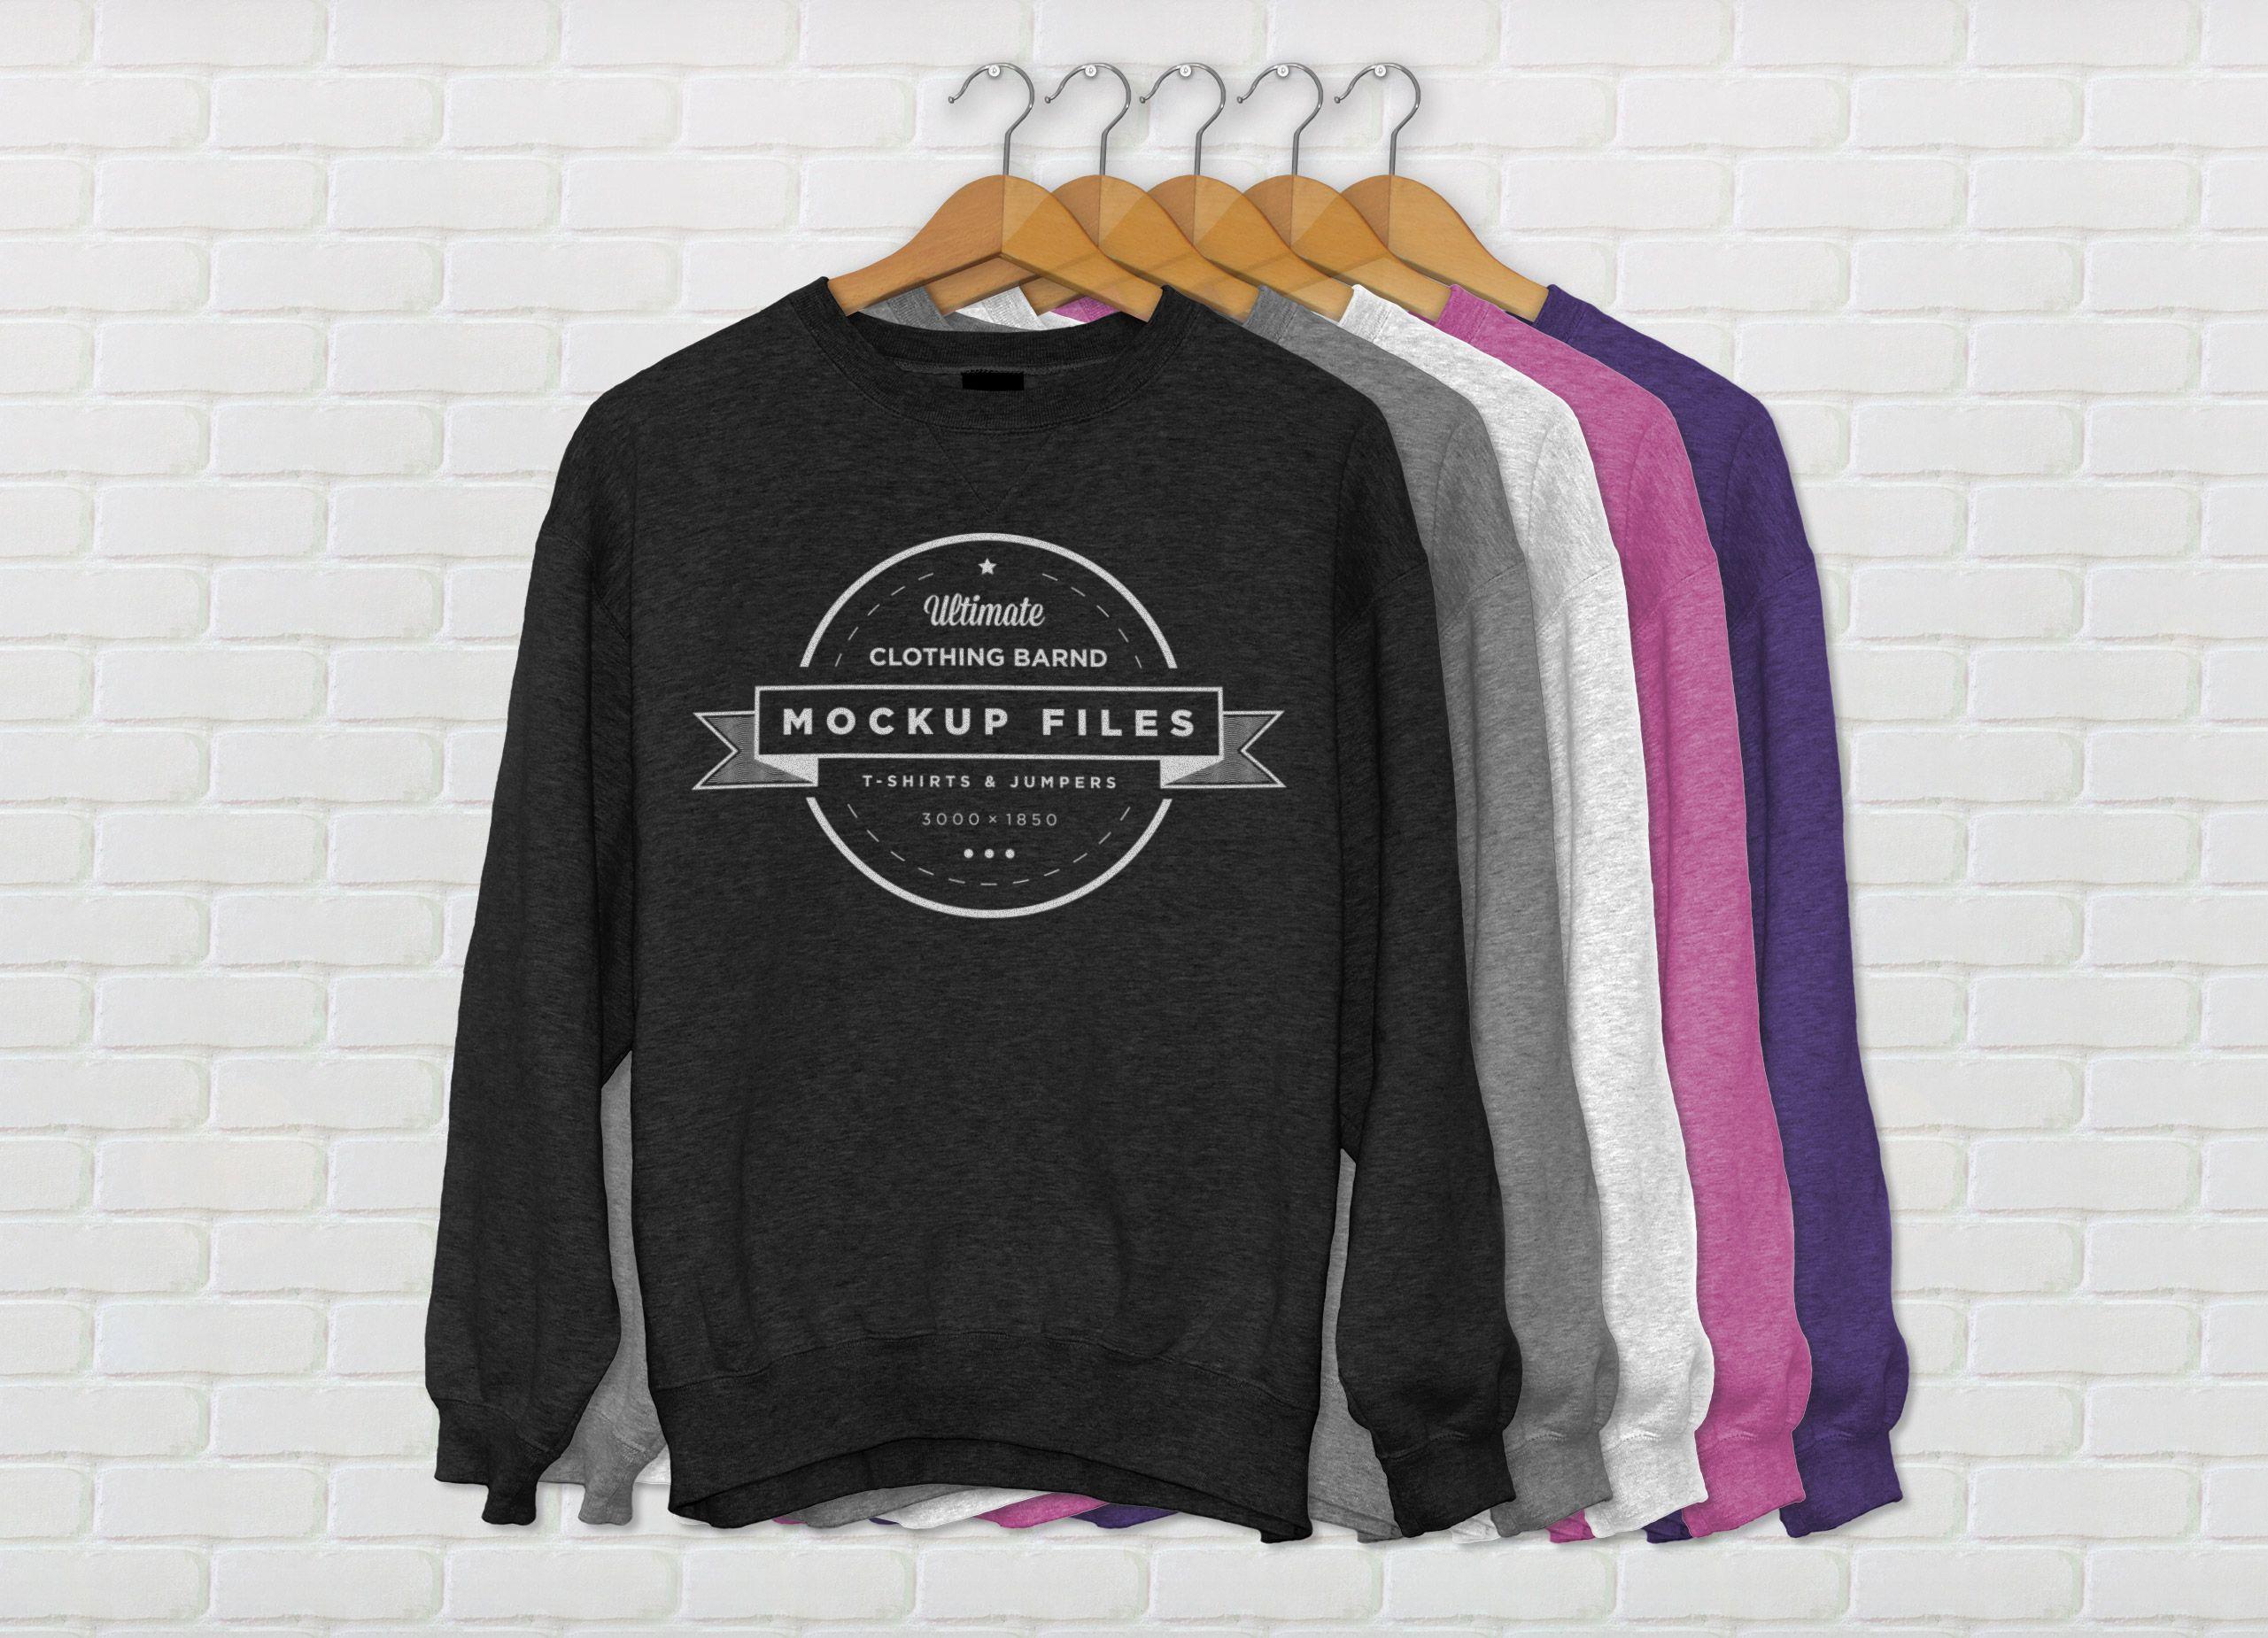 Download Sweater Mockup Free Psd Psdexplorer Clothing Mockup Shirt Mockup Mockup Psd